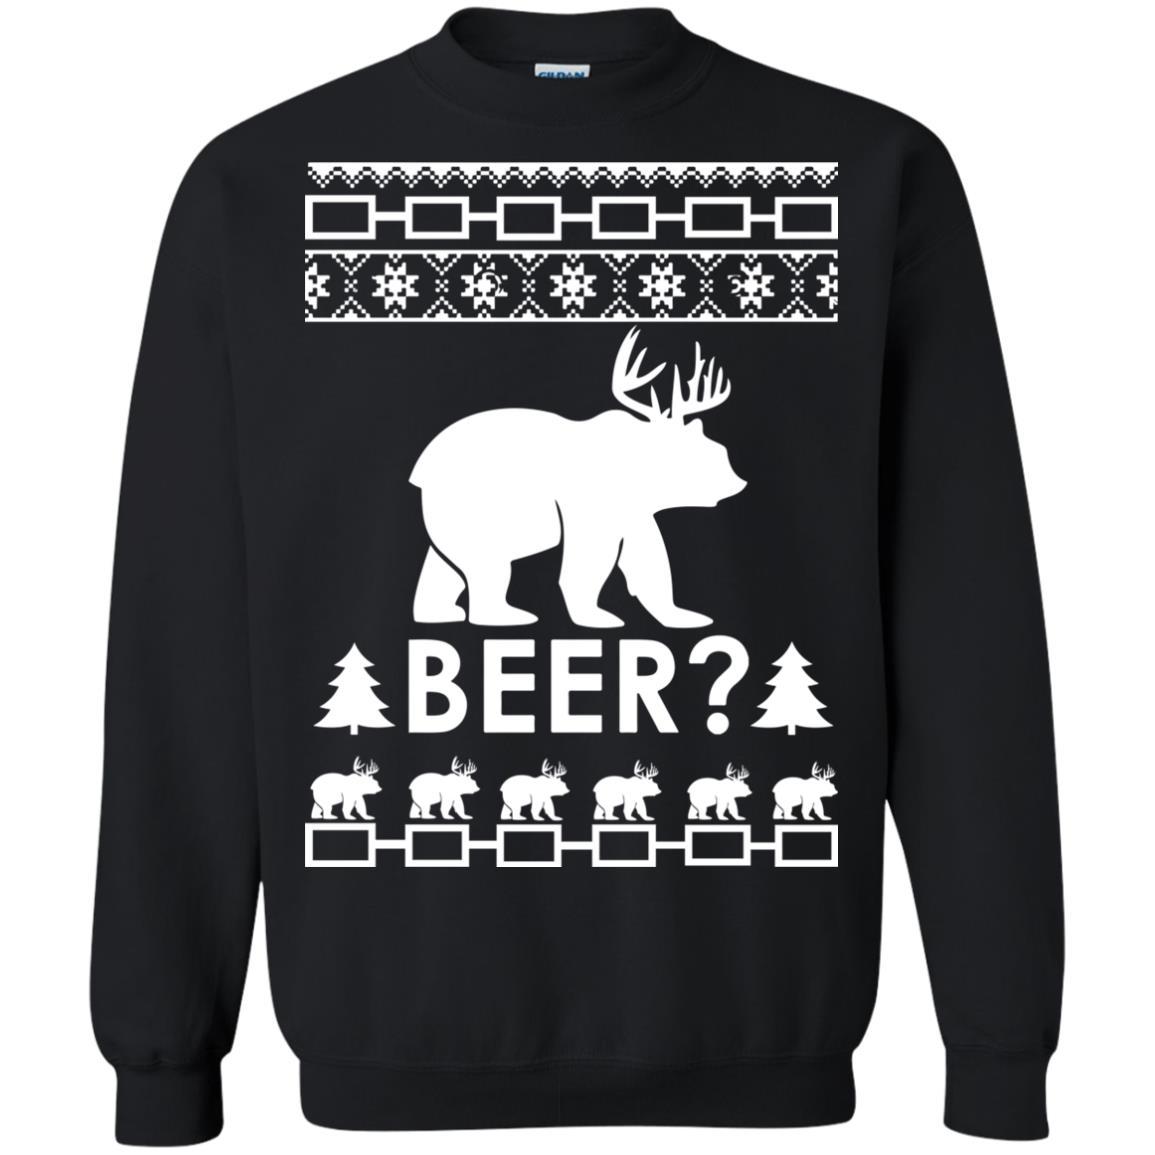 image 2365 - Christmas Beer Bear-Reindeer Ugly Sweater, Shirt